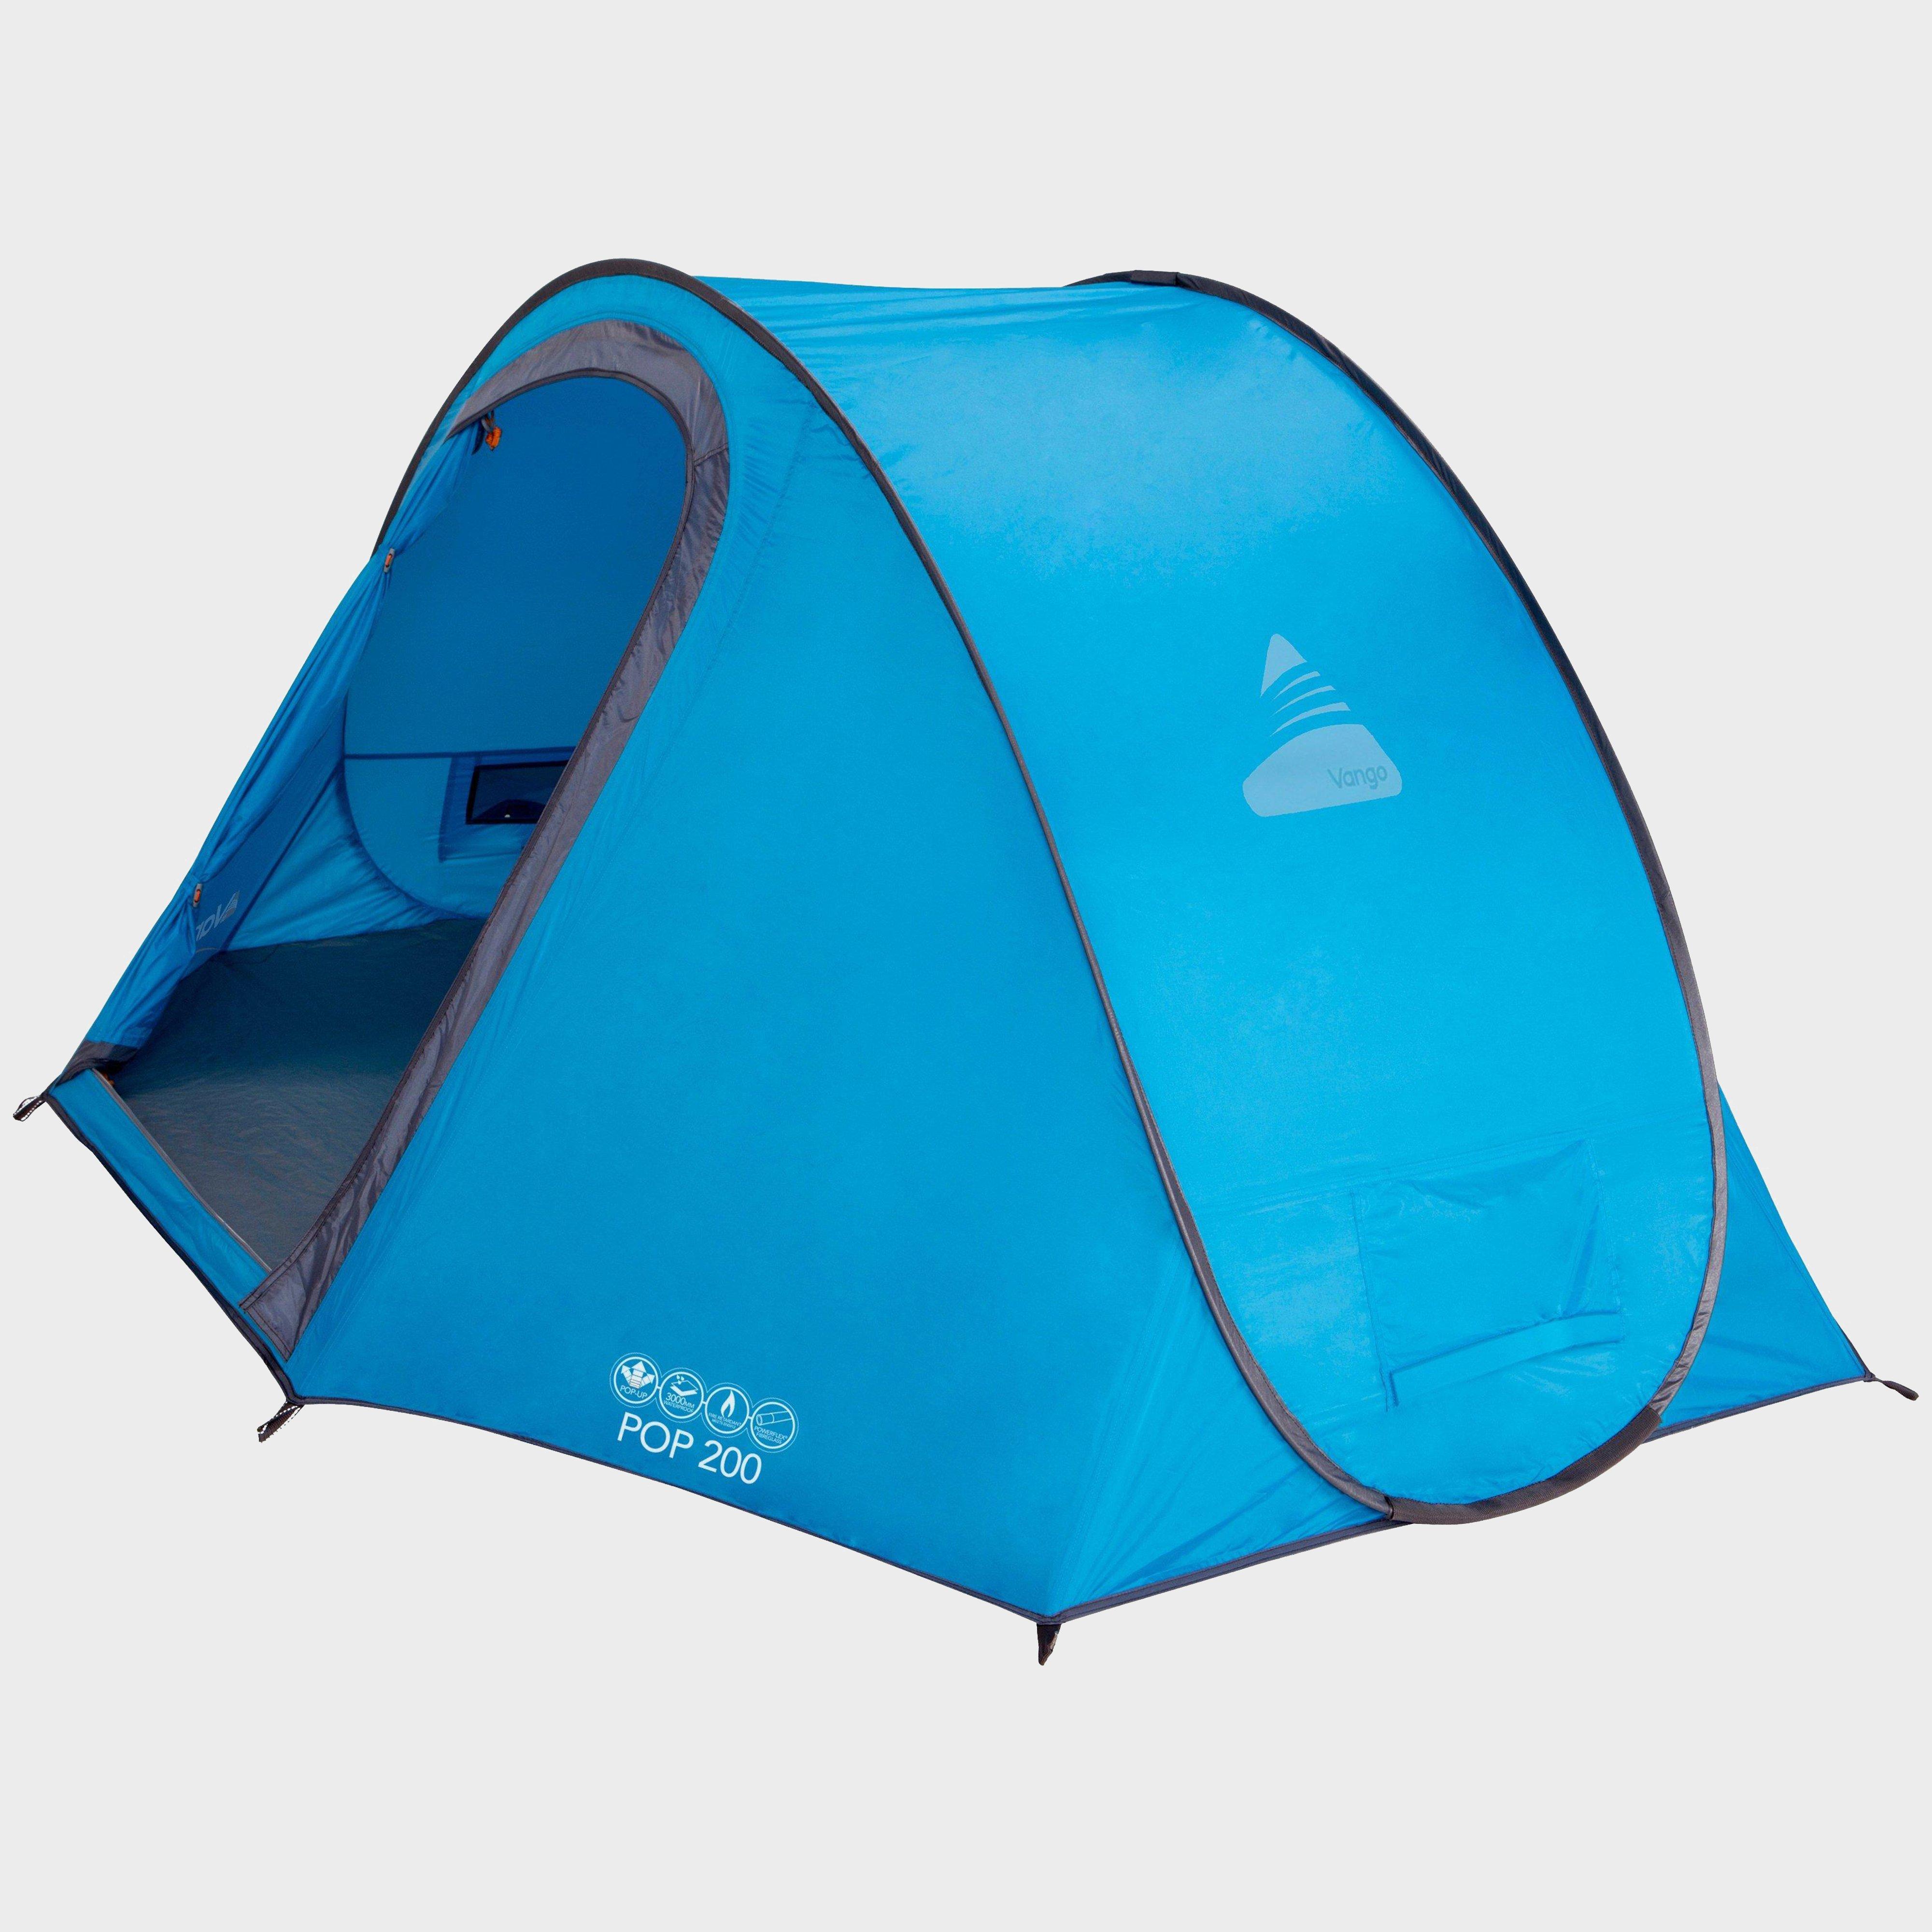 Vango Pop 200 2 Person Tent  Blue Blue